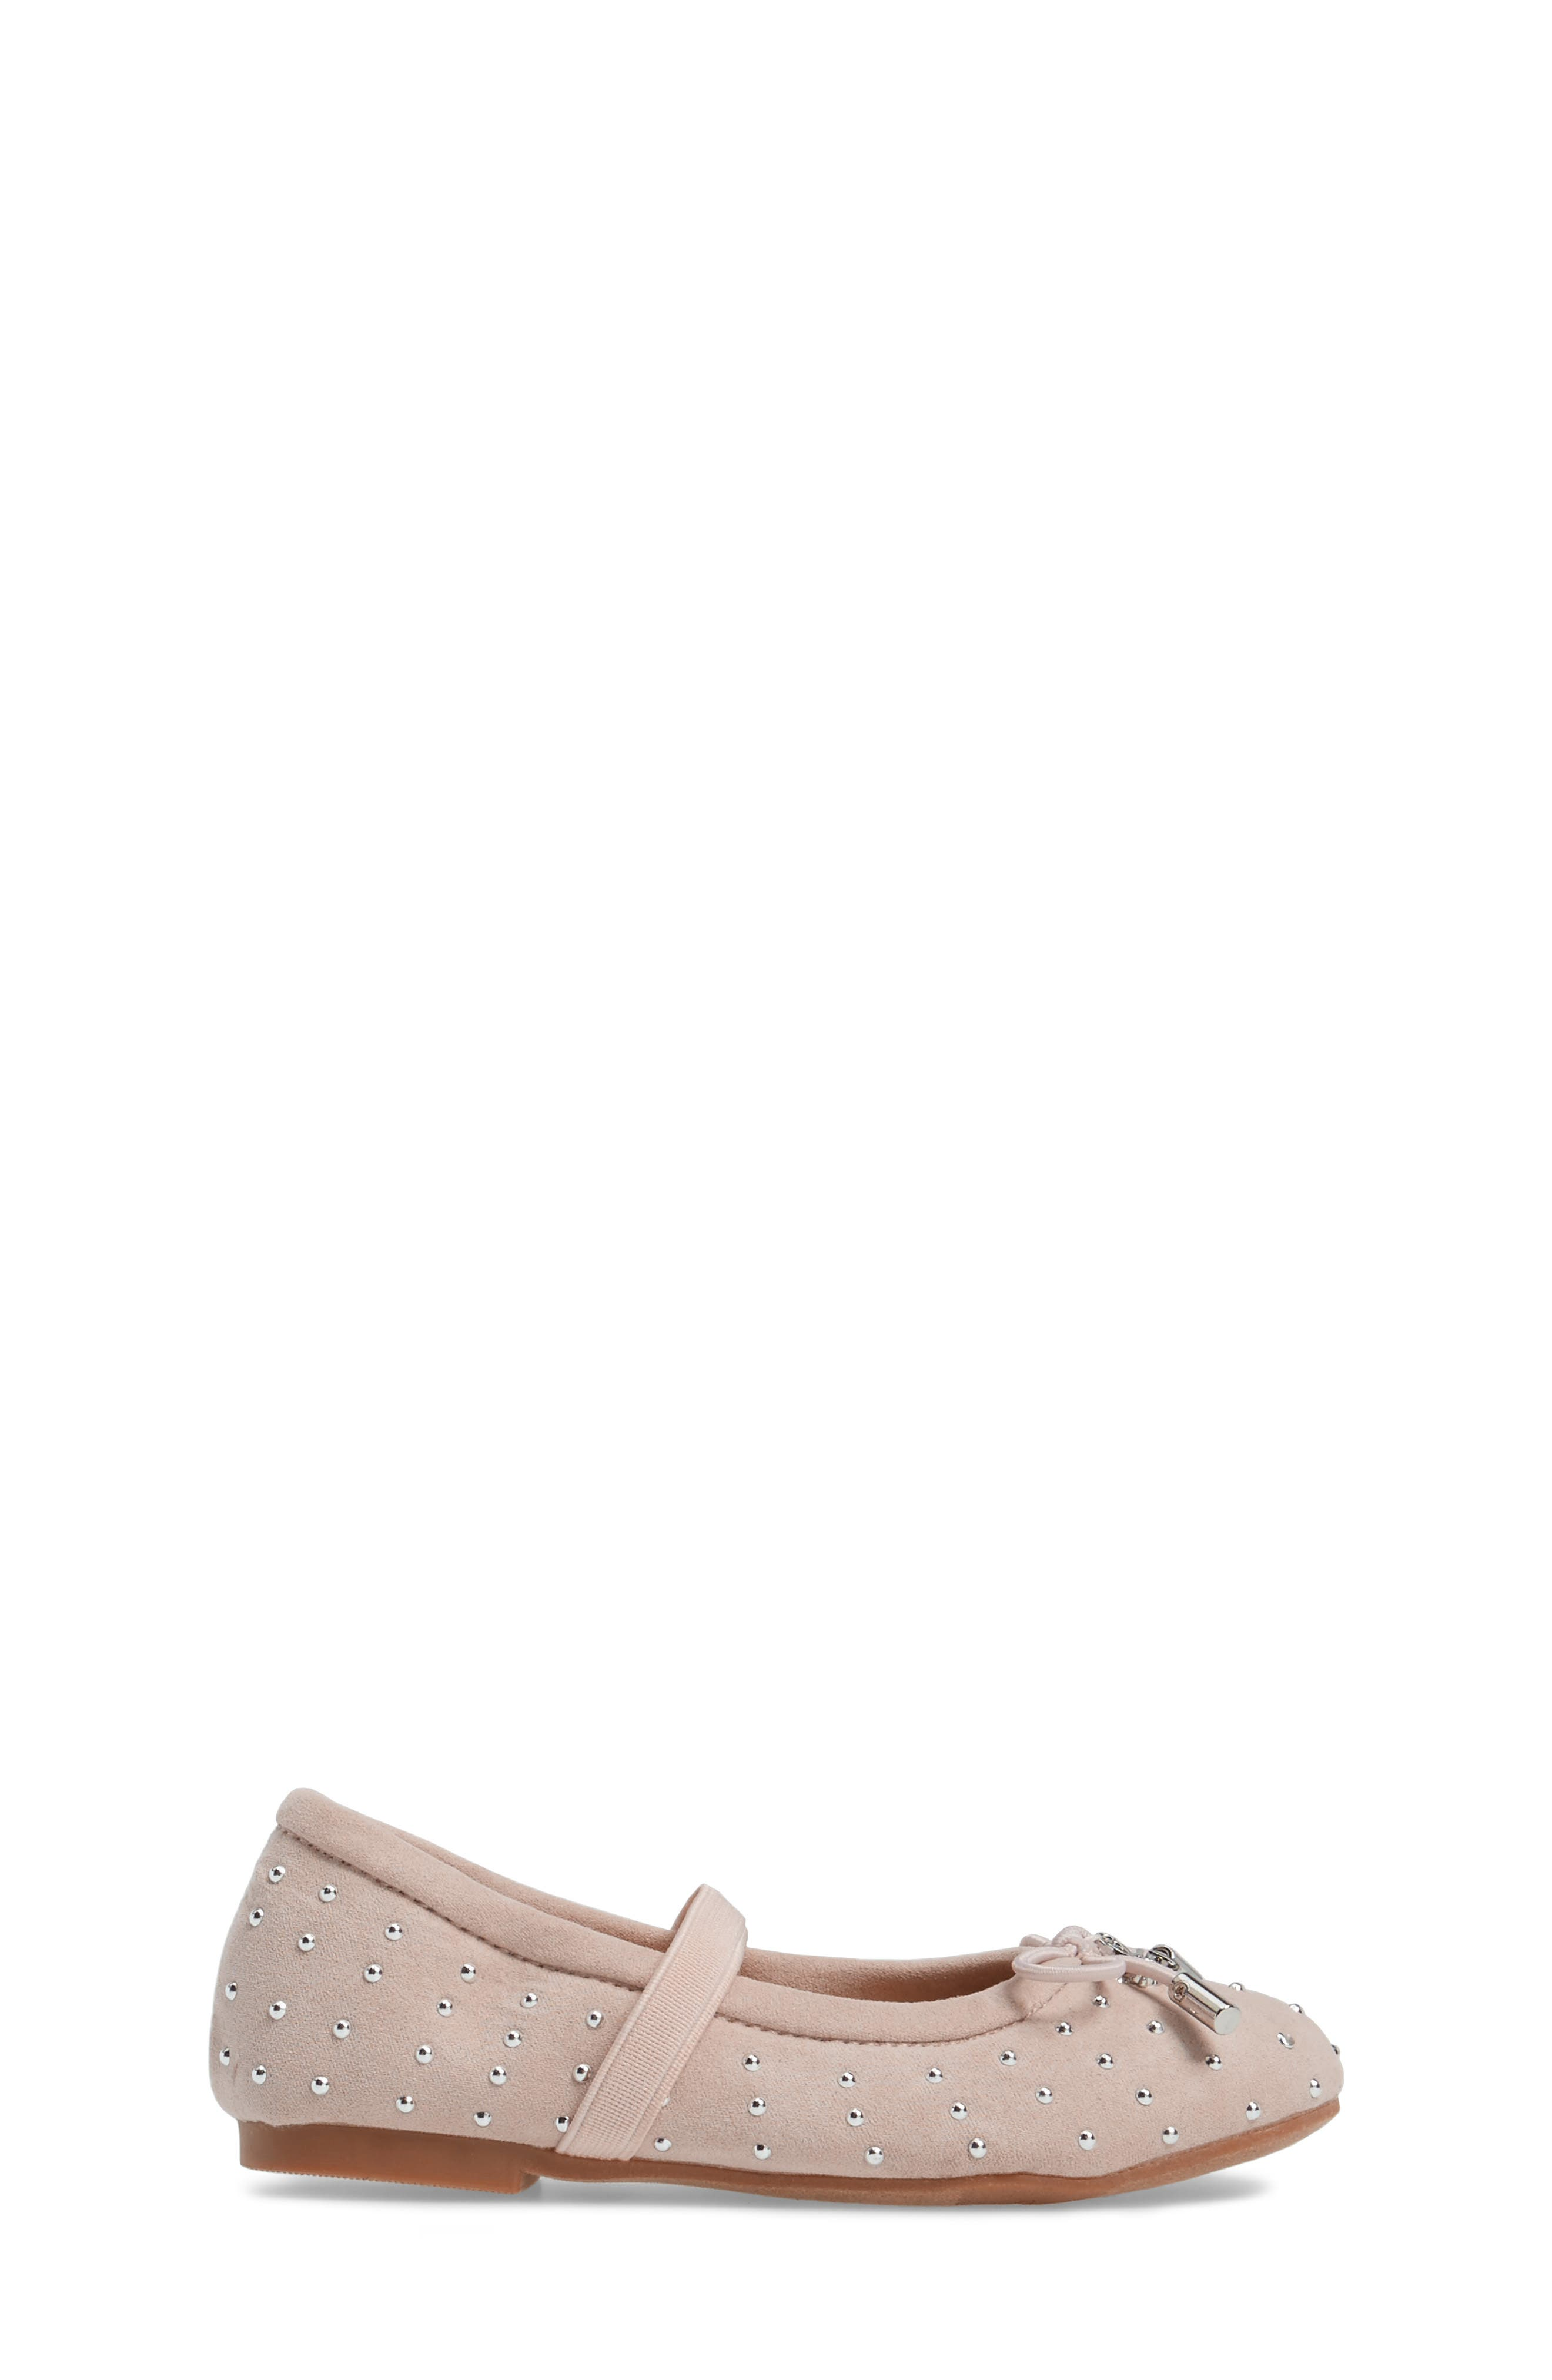 Felicia Ballet Flats,                             Alternate thumbnail 3, color,                             652